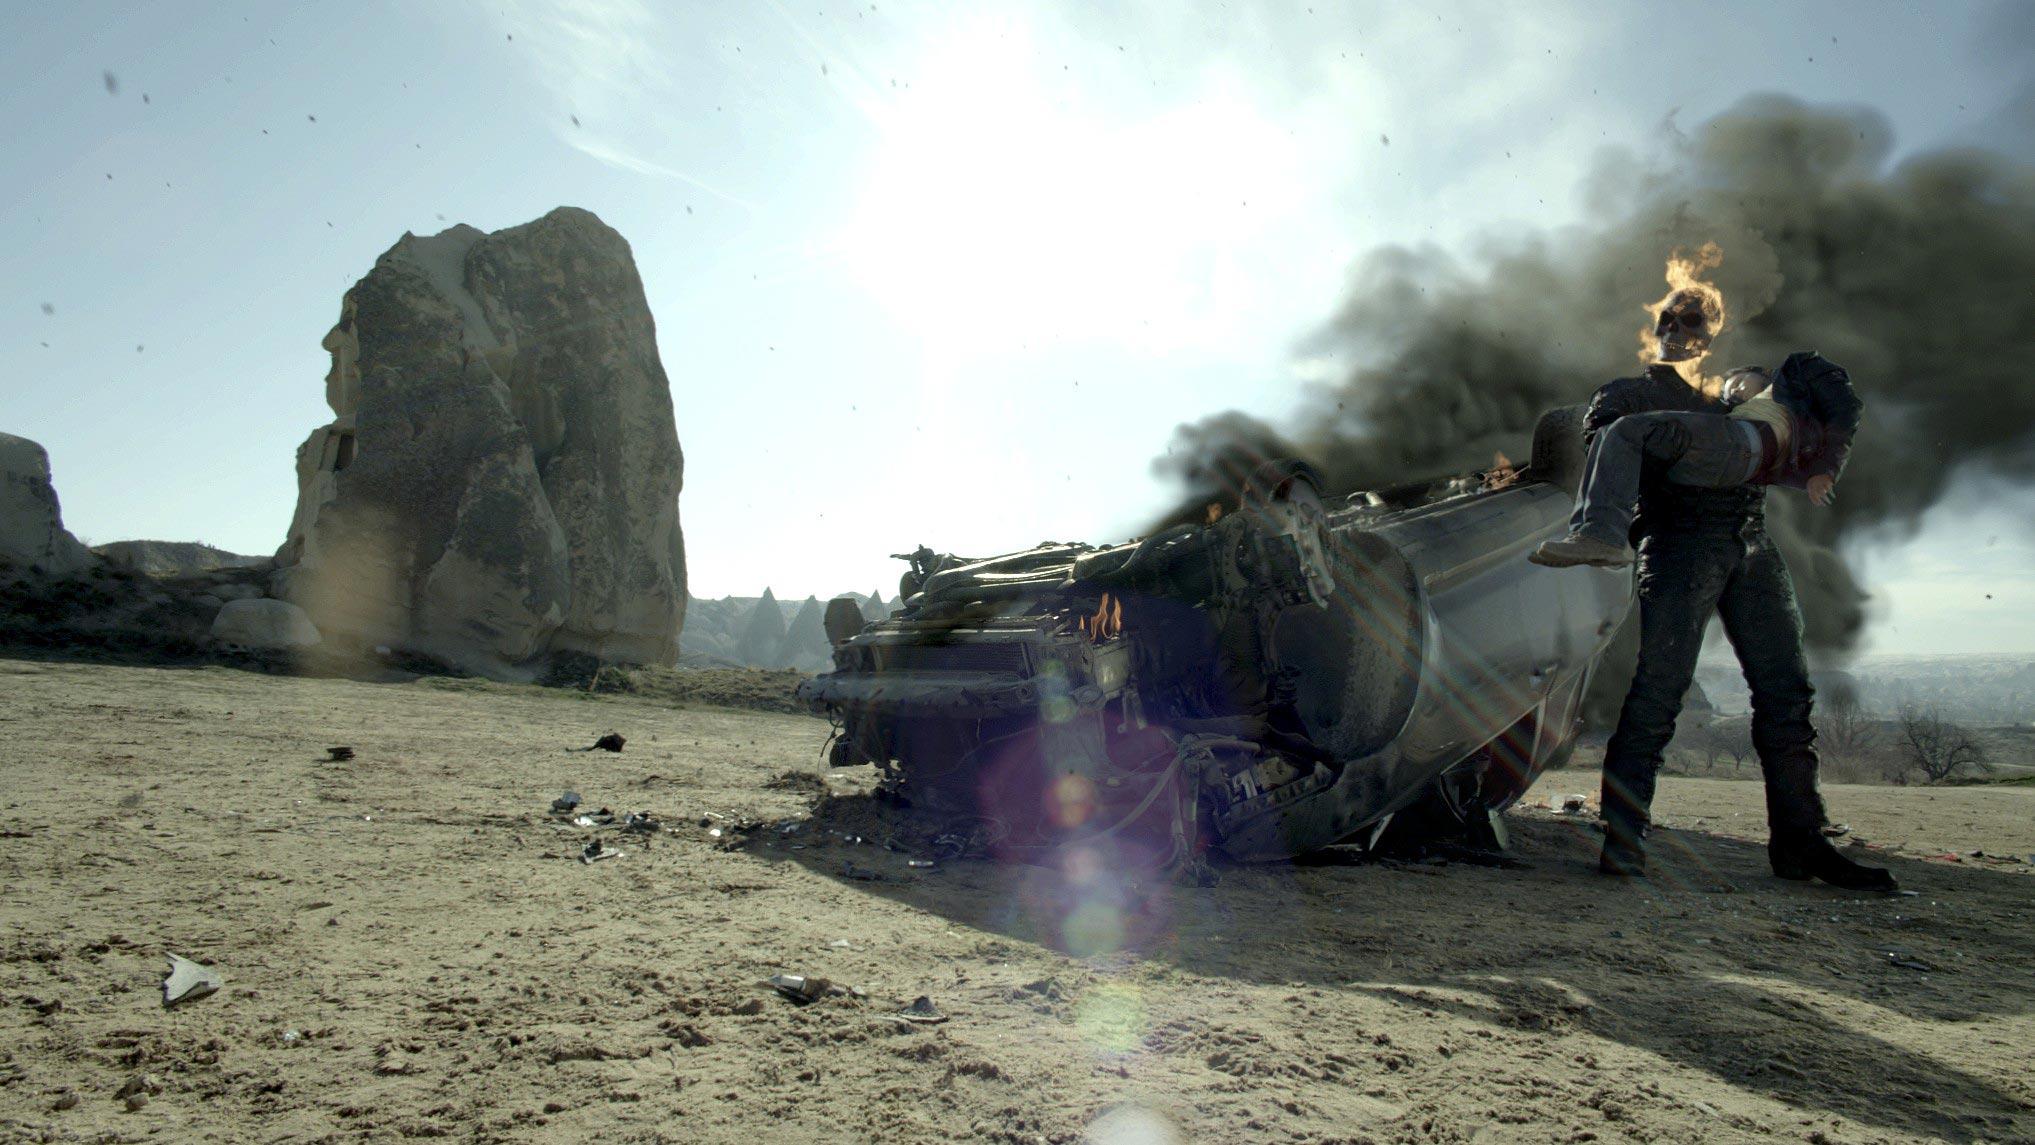 http://www.filmofilia.com/wp-content/uploads/2012/02/Ghost_Rider_2_p44.jpg